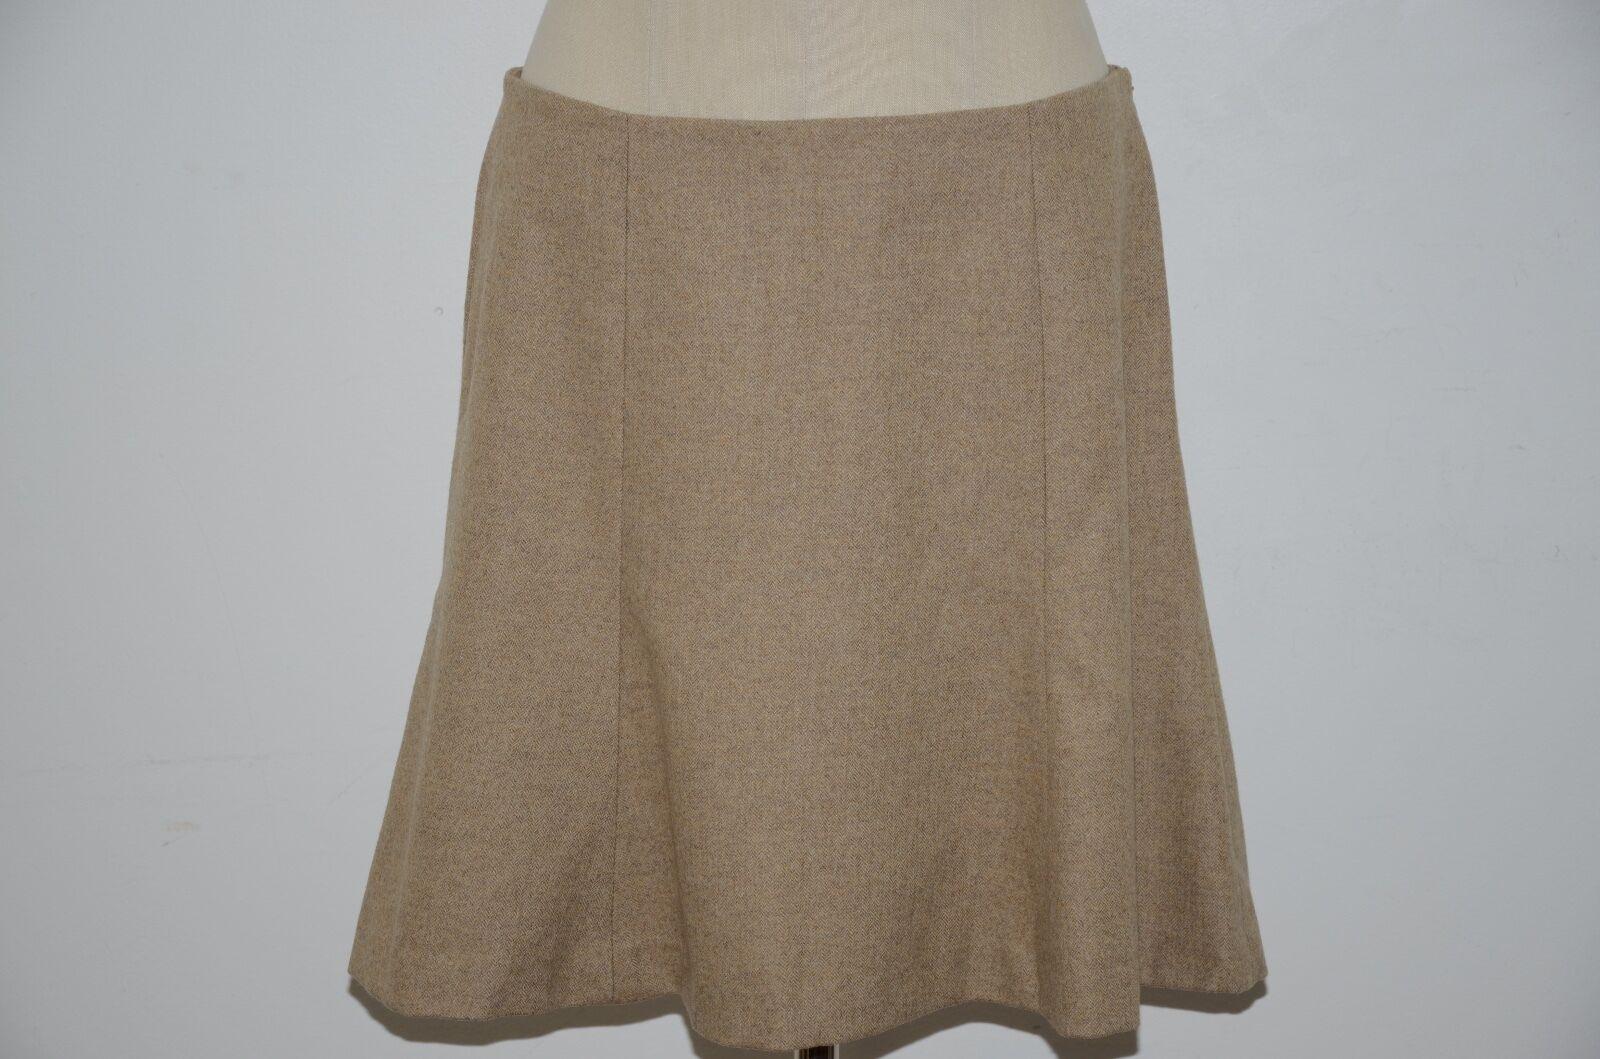 Ralph Lauren bluee Label Silk Lined 100% Wool Herringbone Skirt 12